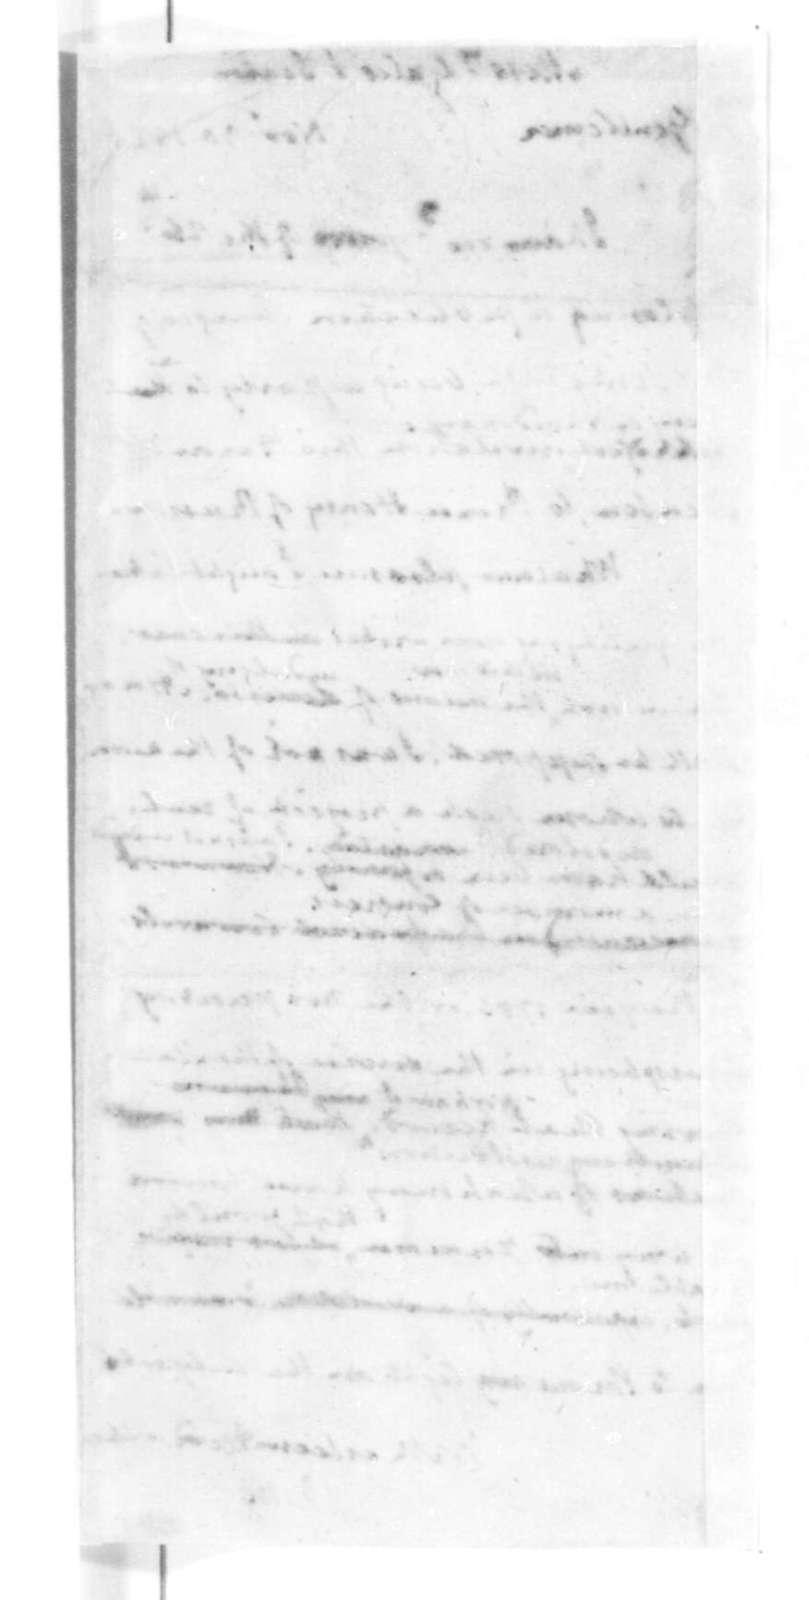 James Madison to Gales & Seaton, November 30, 1825.